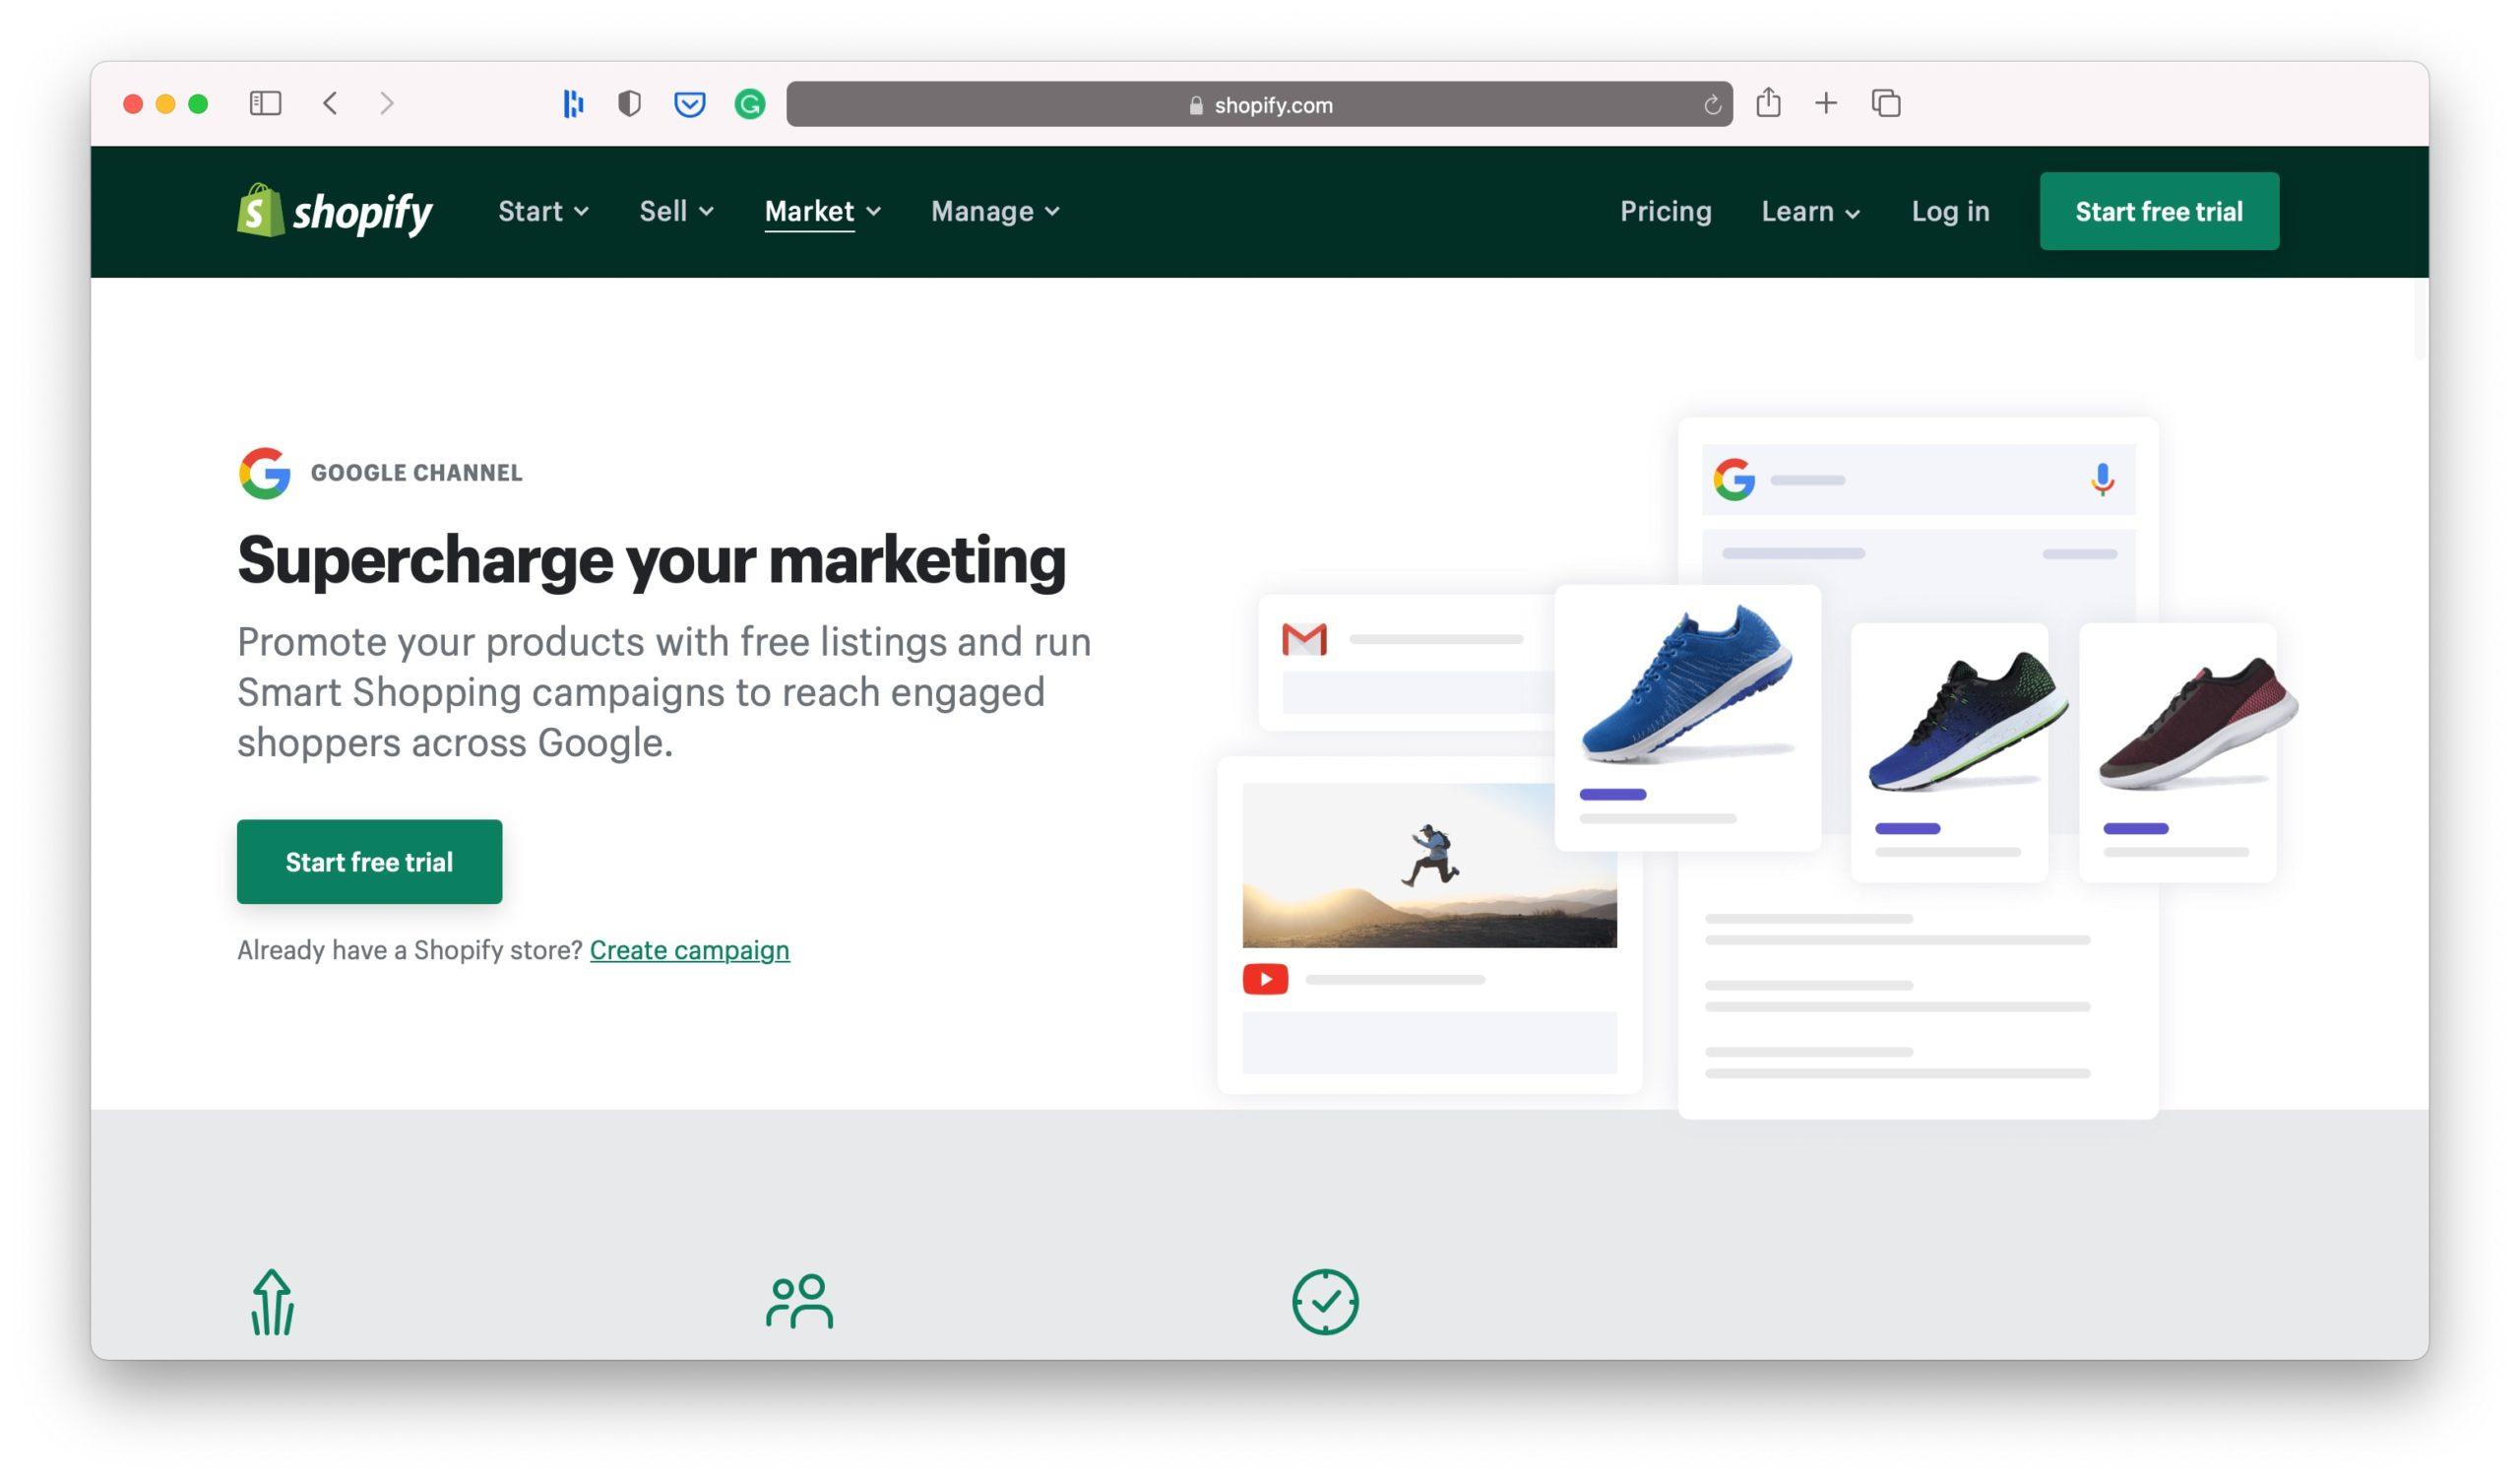 Google Shopify Marketing Channels